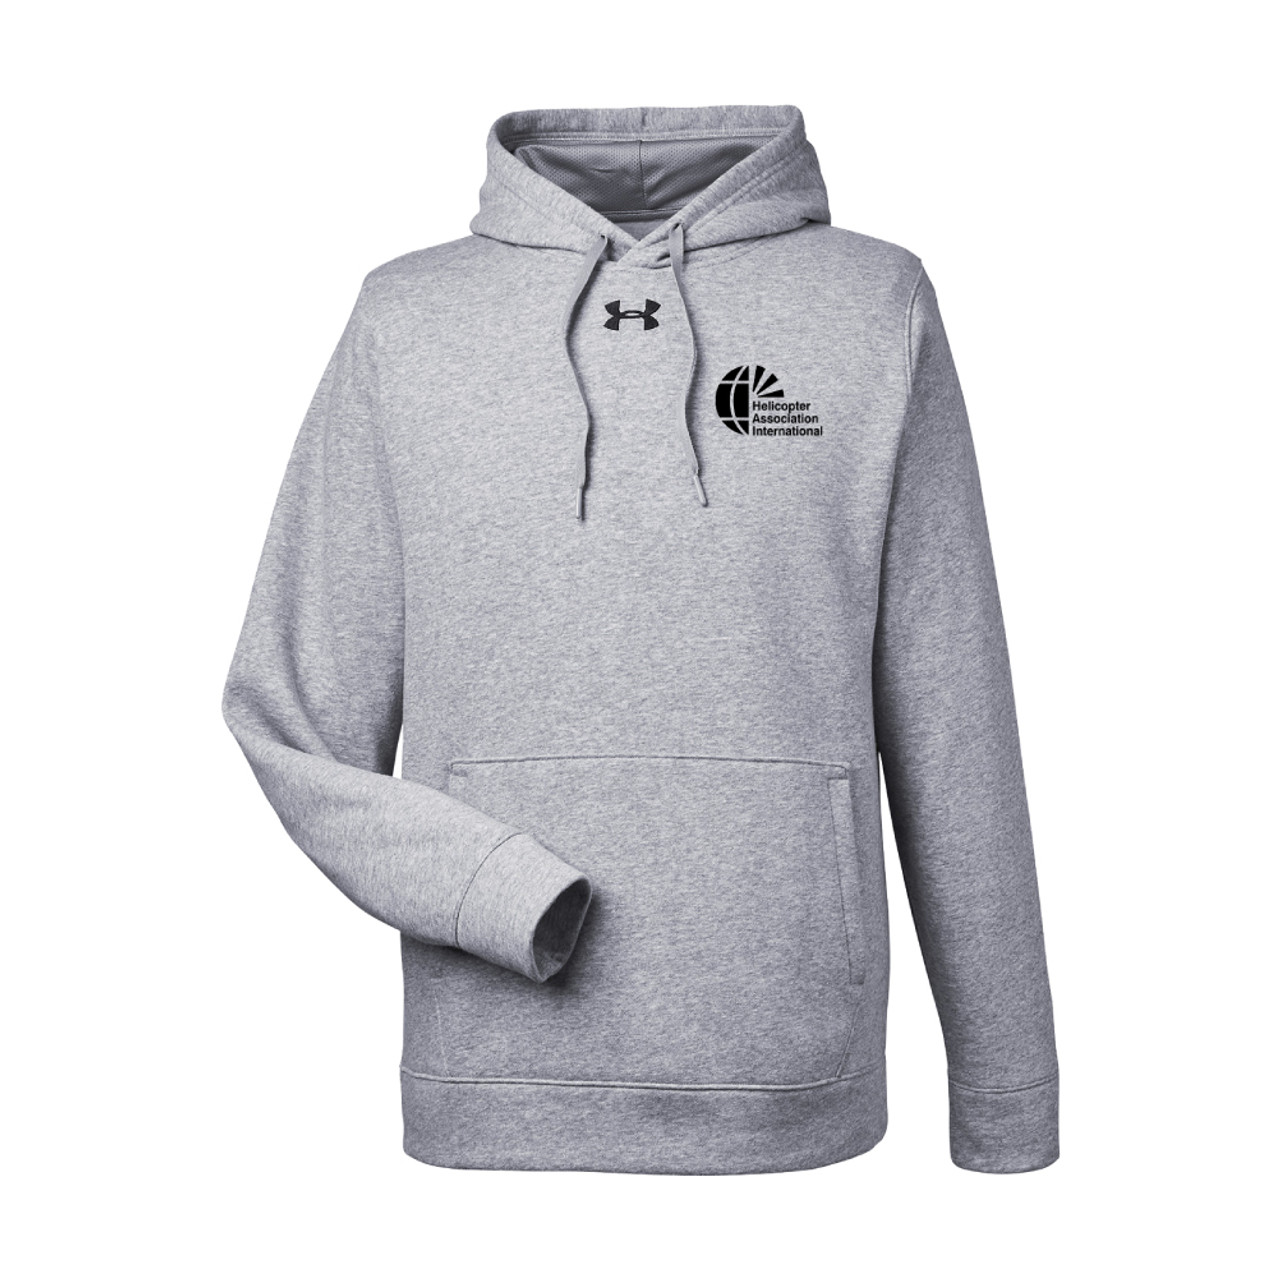 Mens Under Armour Gray Pullover Hood Sweatshirt